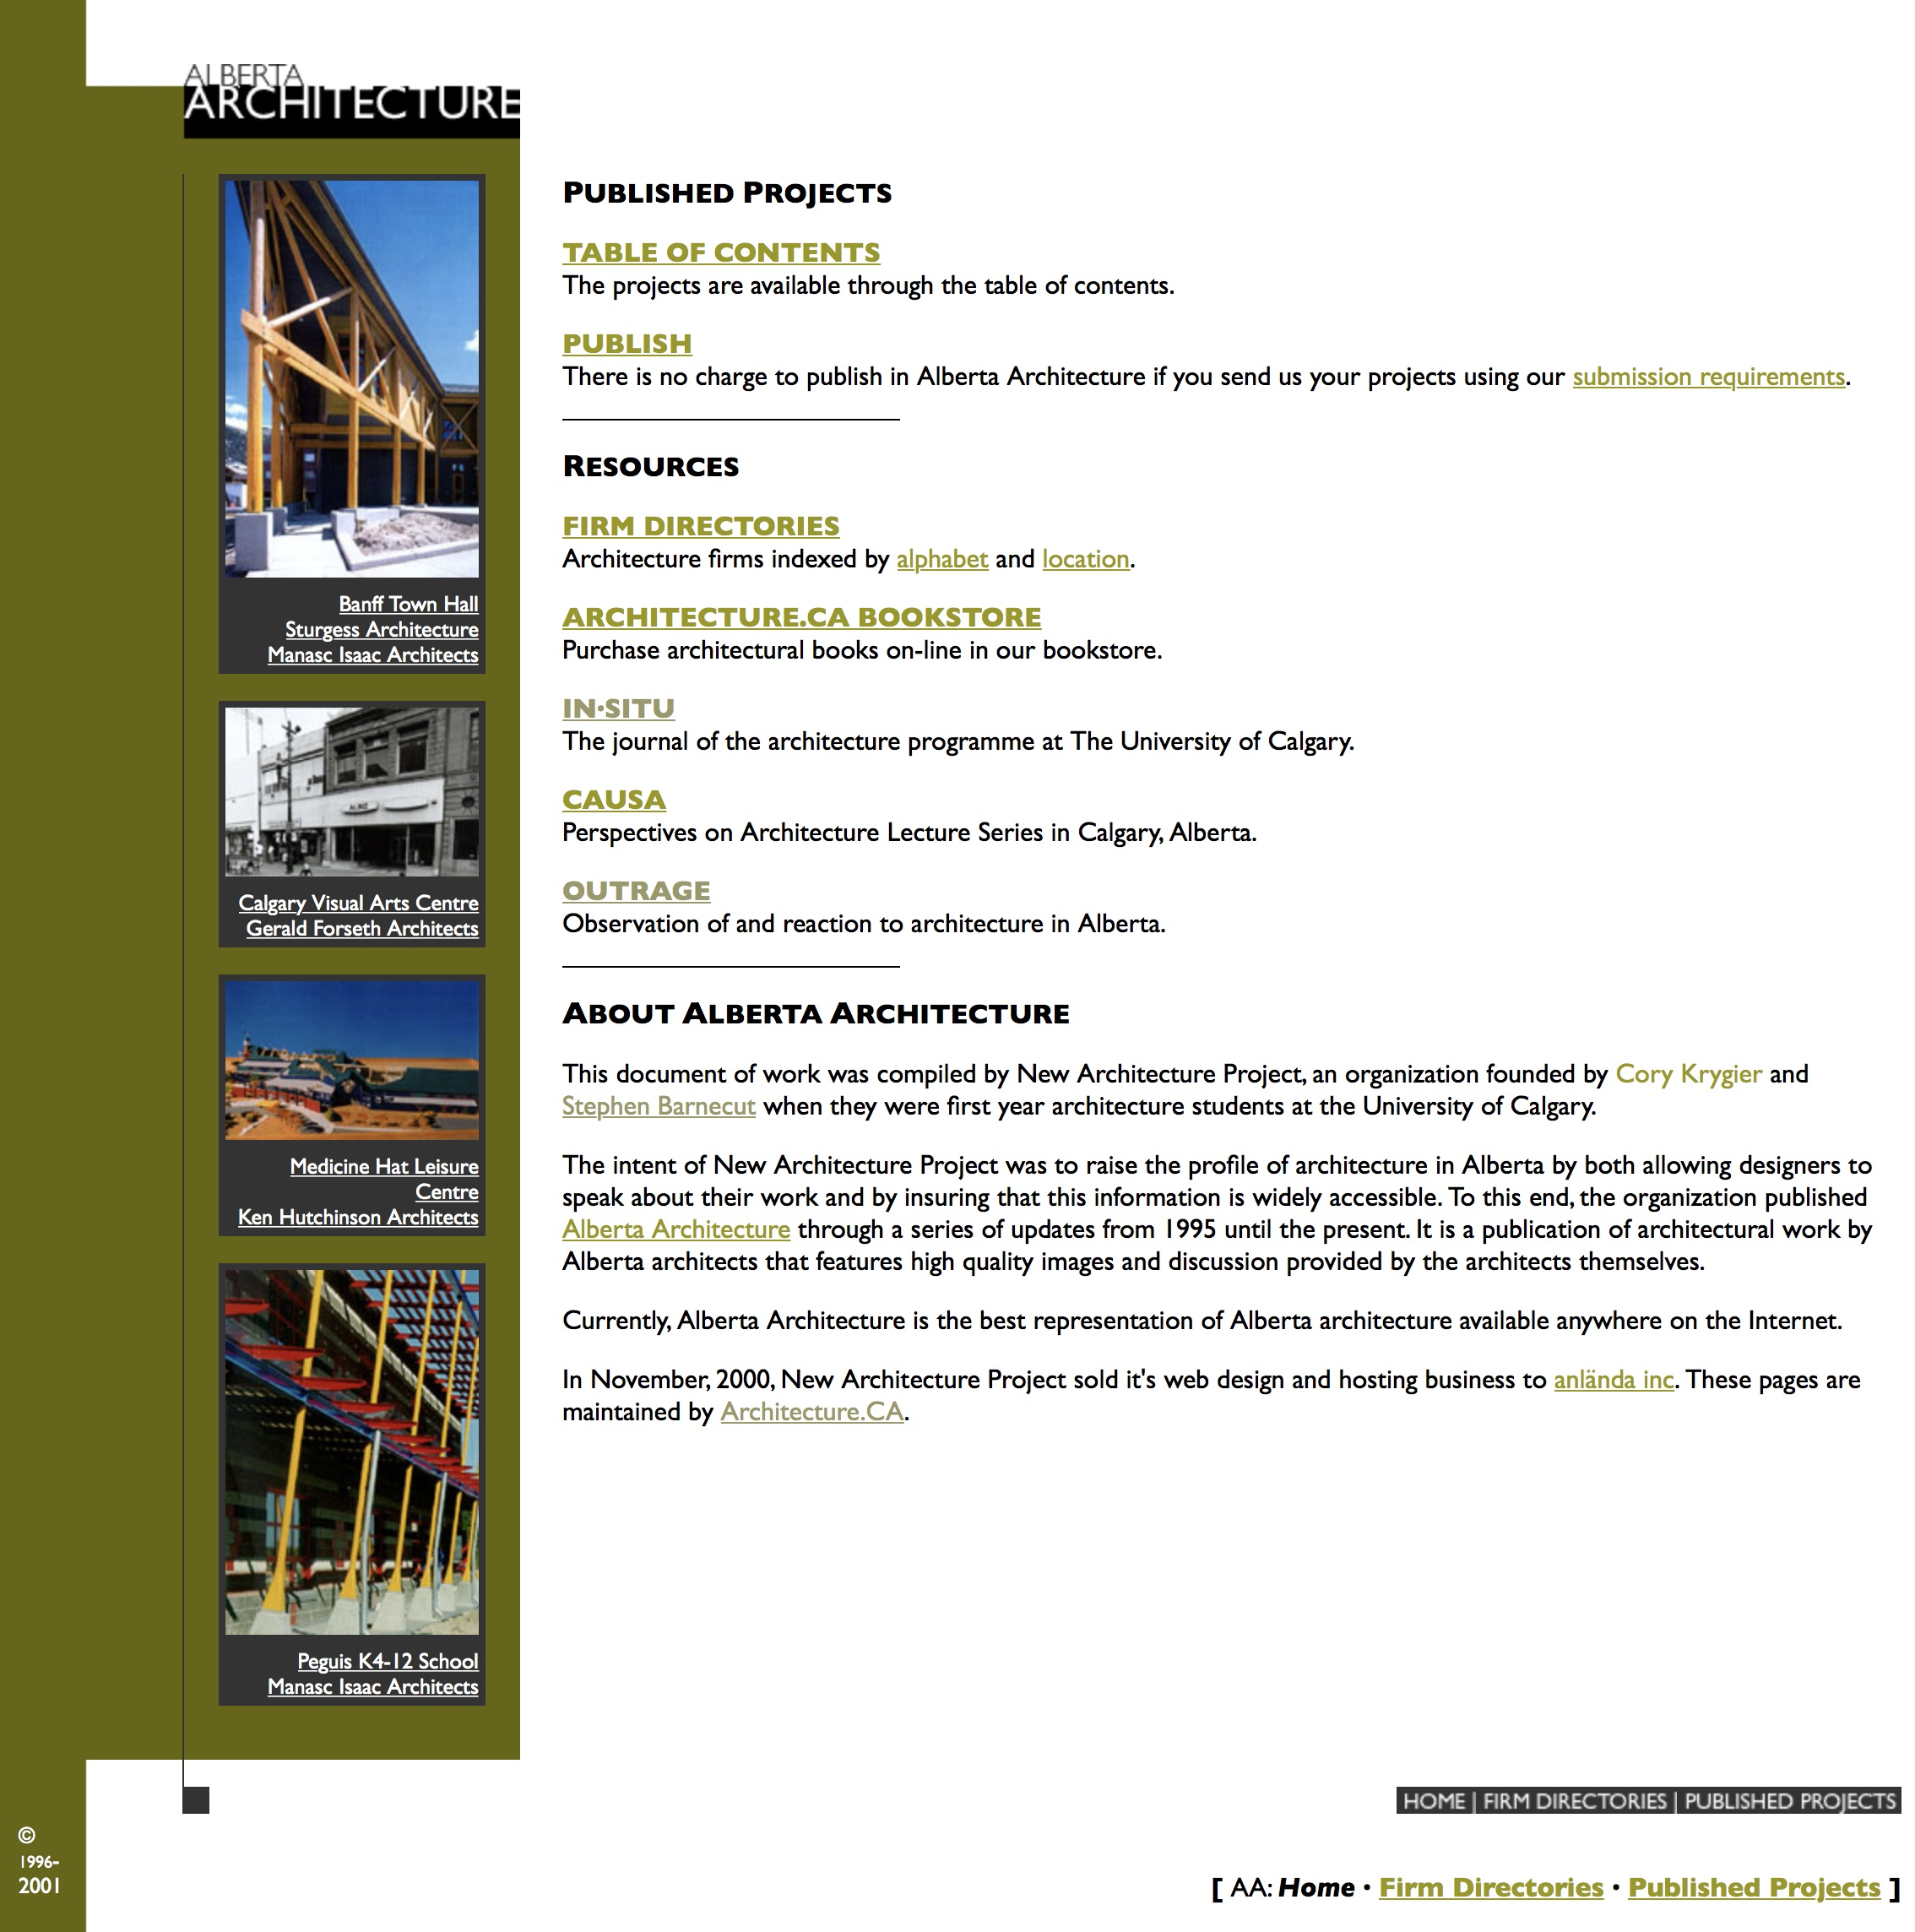 Alberta Architecture Home Page.jpg